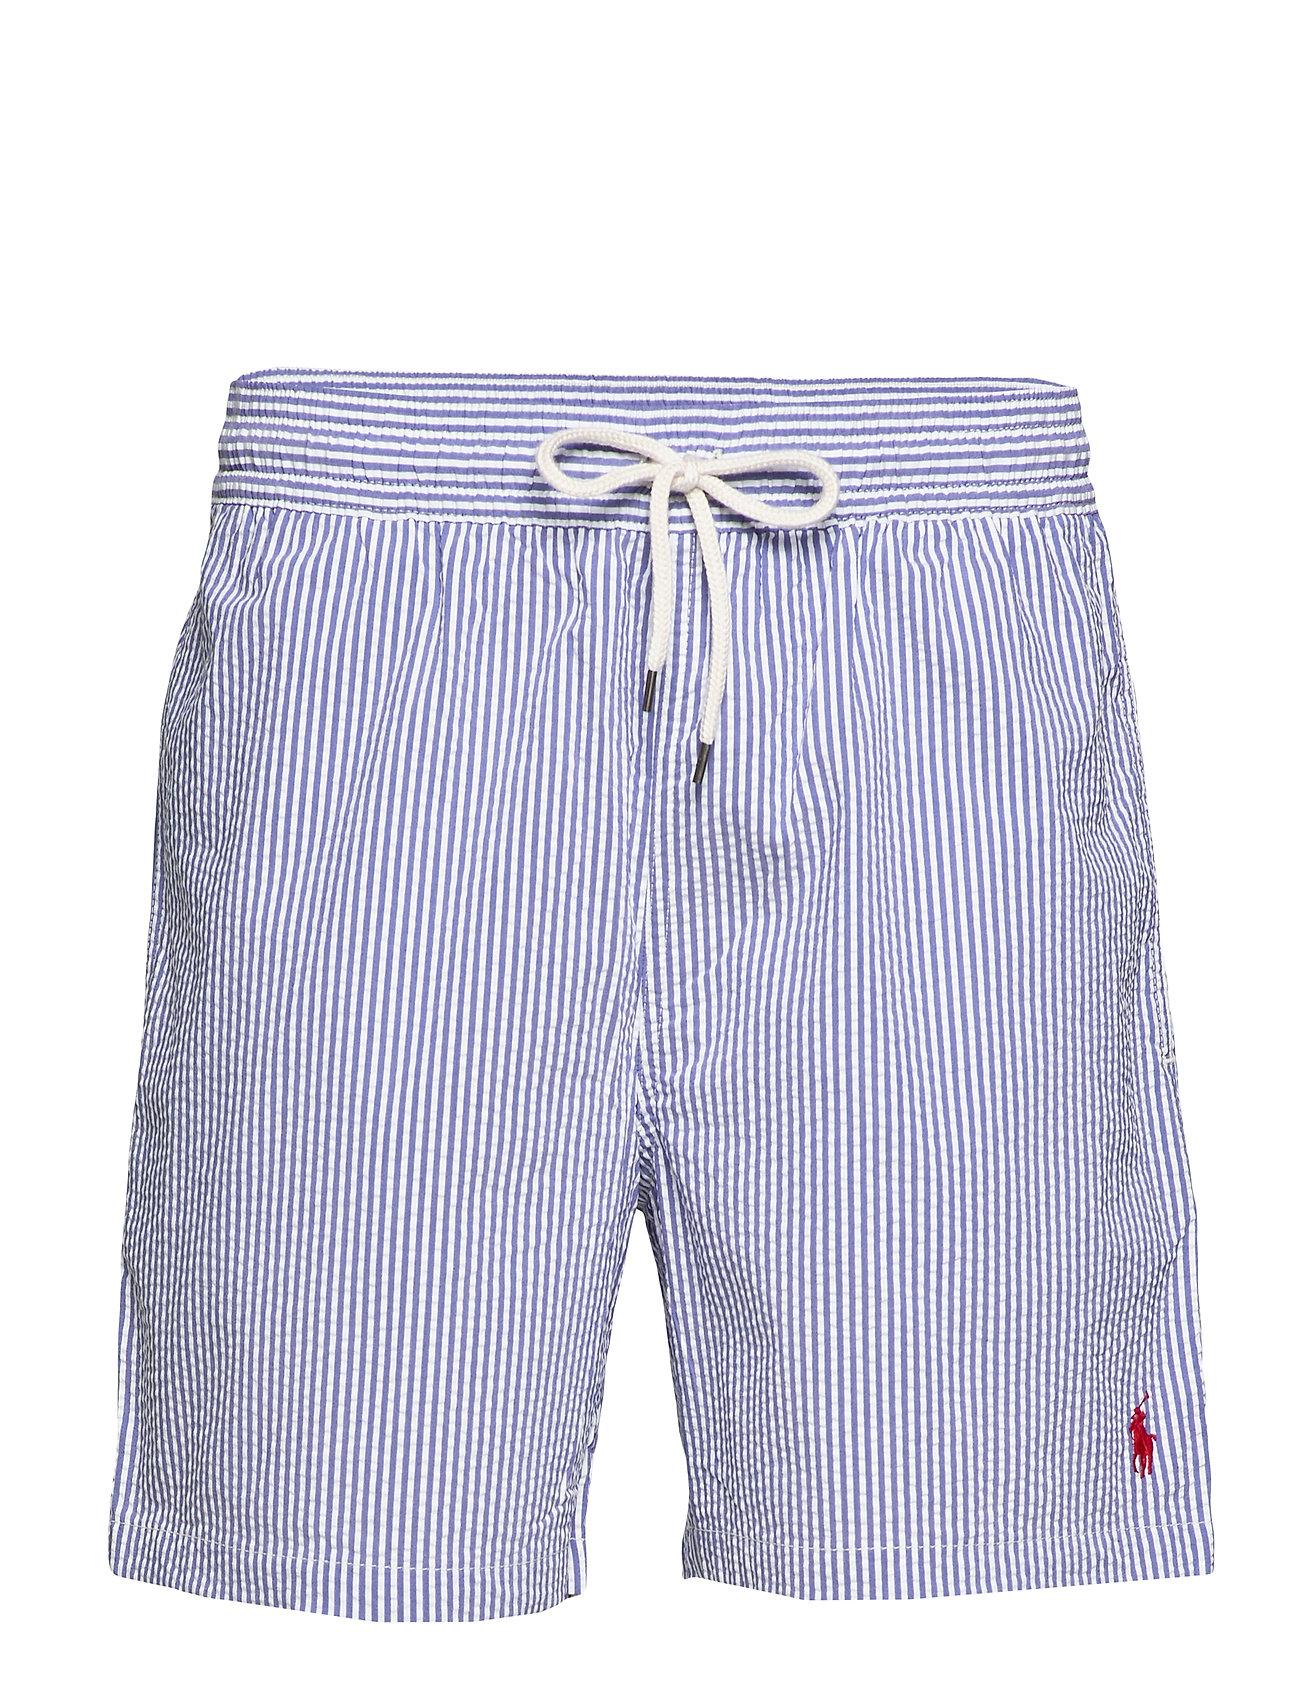 Polo Ralph Lauren 5½-Inch Traveler Swim Trunk - CRUISE ROYAL SEER